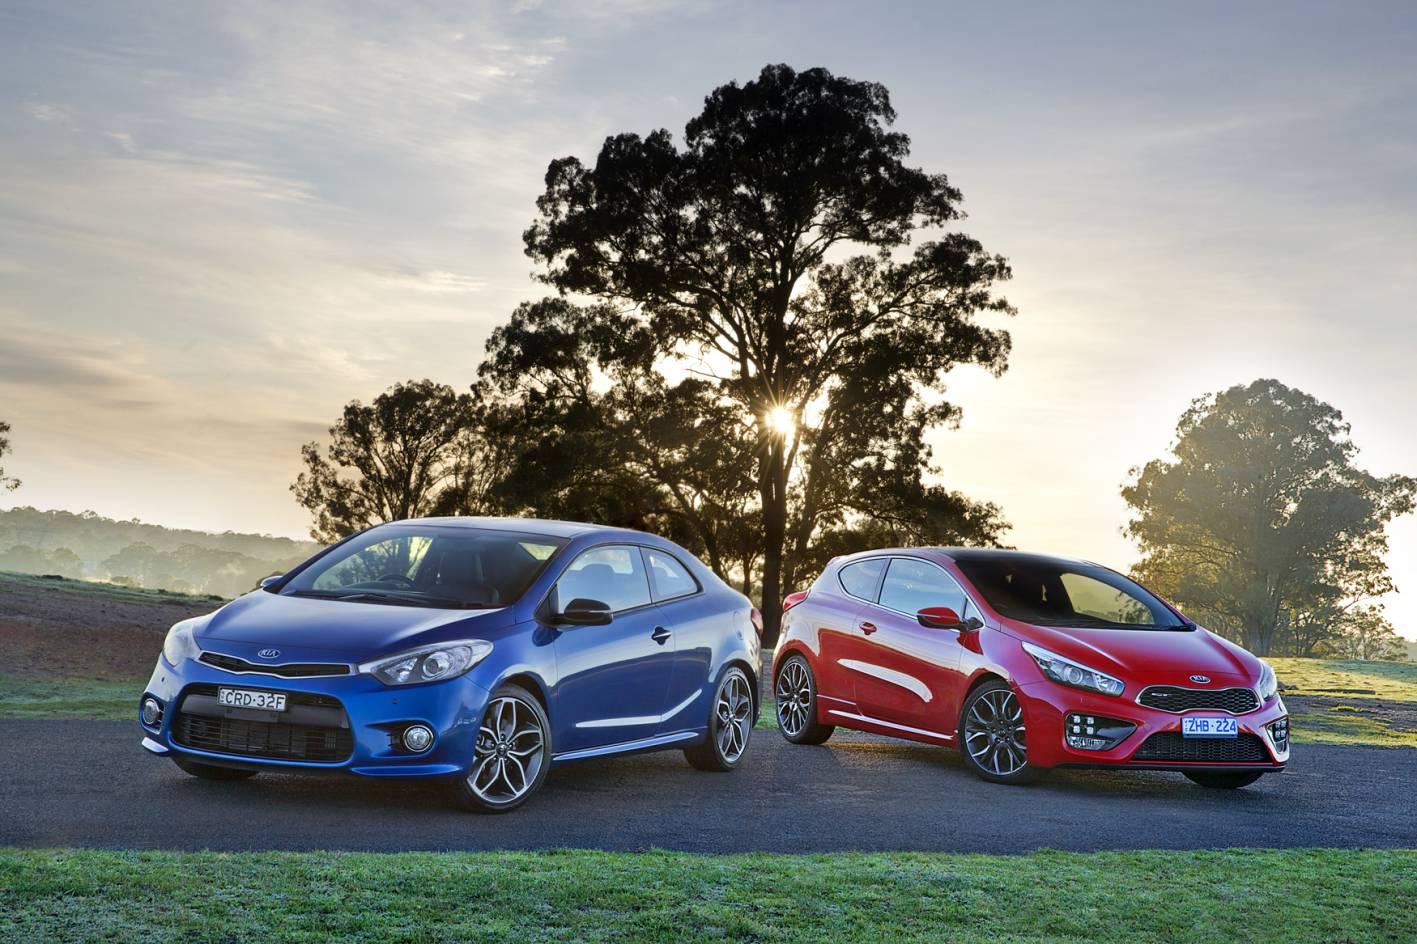 news kia australia announces  year unlimited kilometre warranty roadside assistance